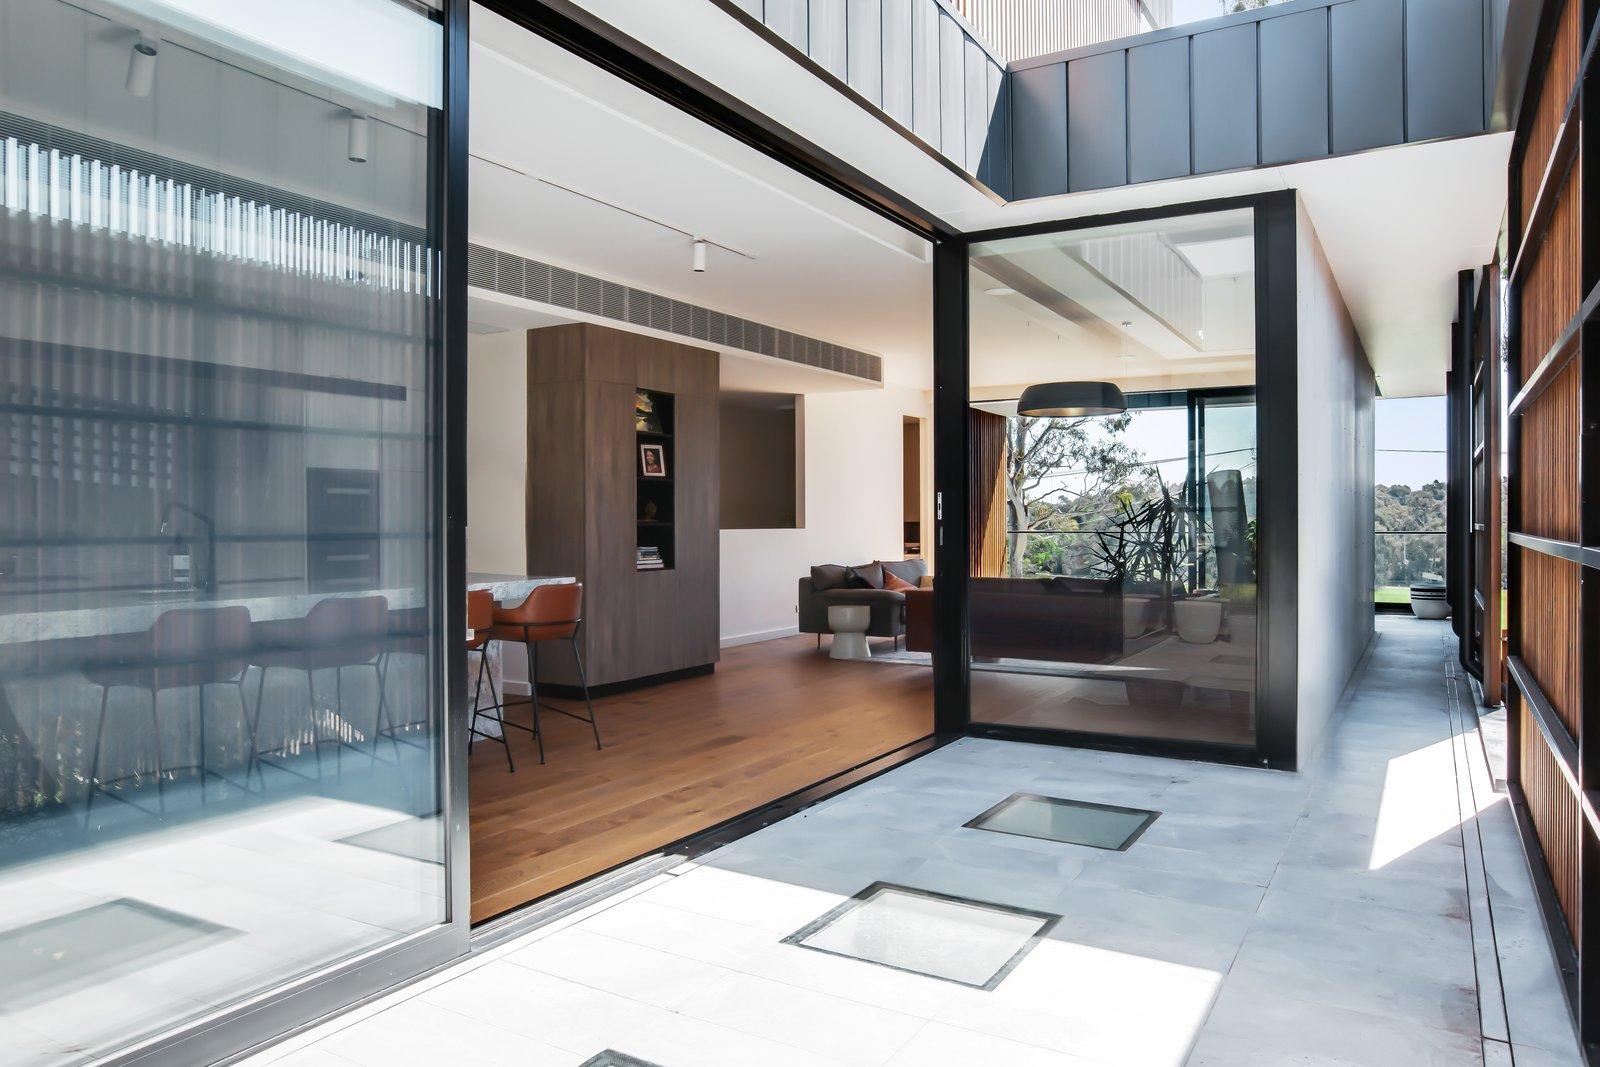 Kew East House interior courtyard